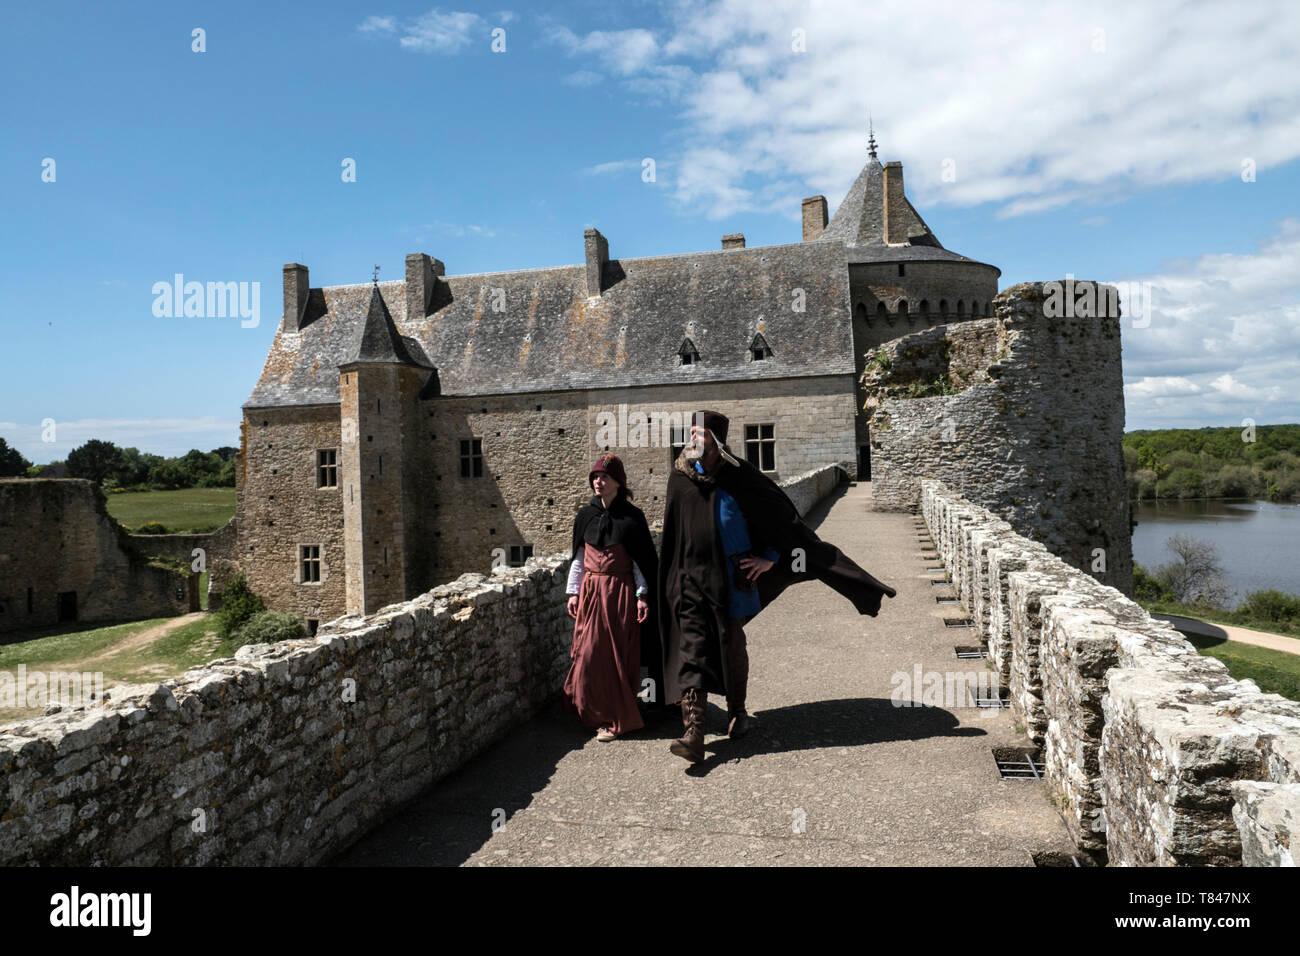 château de Suscinio, Sarzeau, Moyen Âge, Morbihan, Bretagne, Golfe du Morbihan, Stock Photo